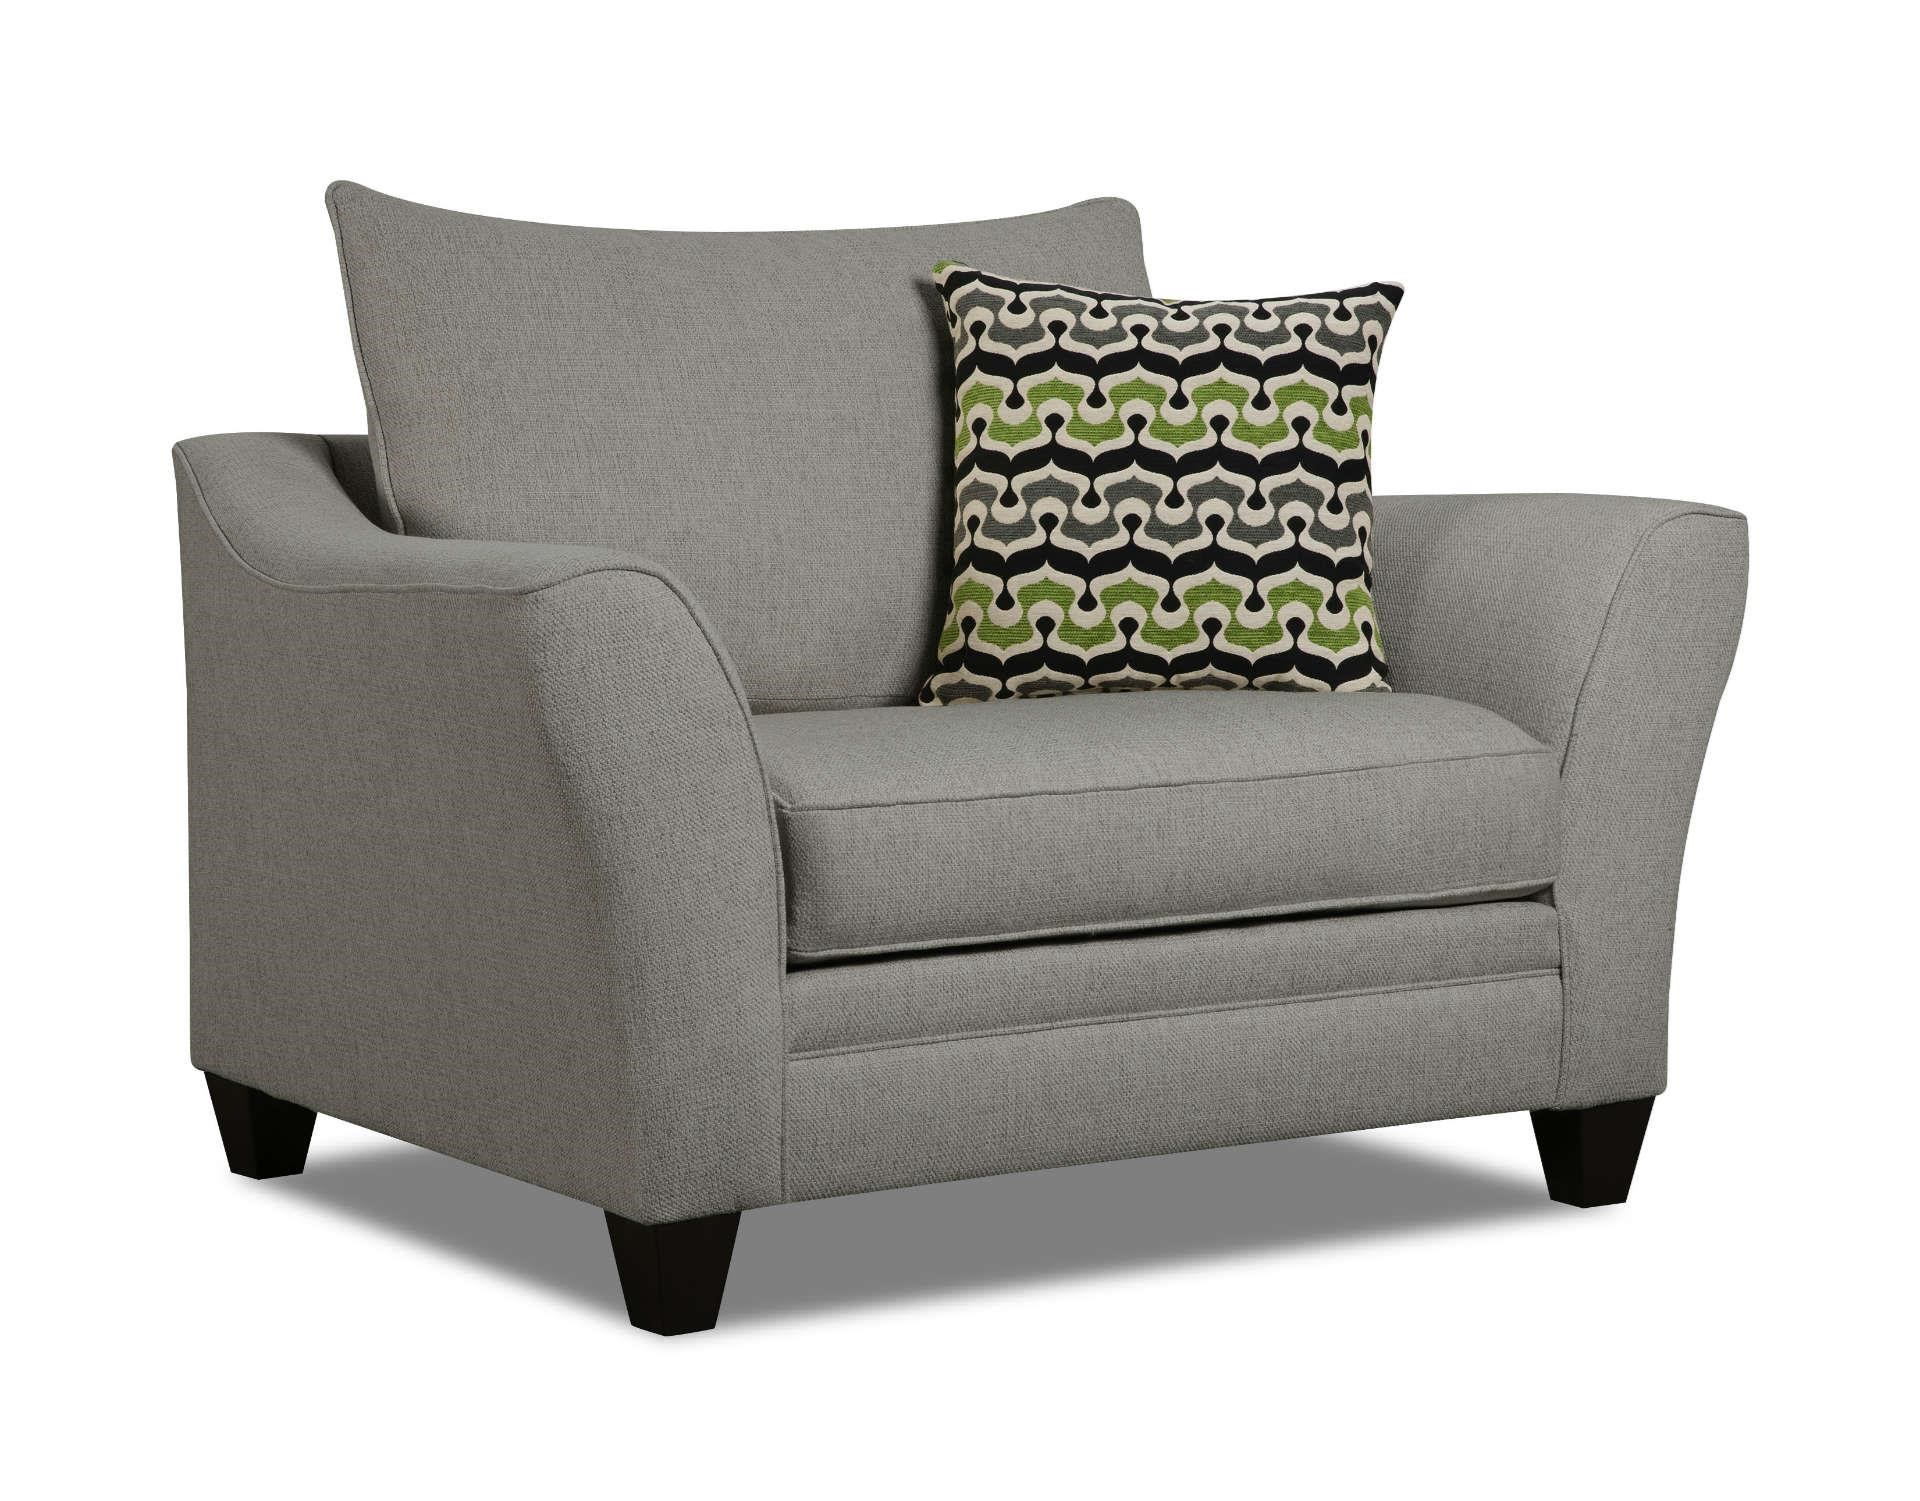 Corinthian Ocala Slate Chair - Item Number: 40b1